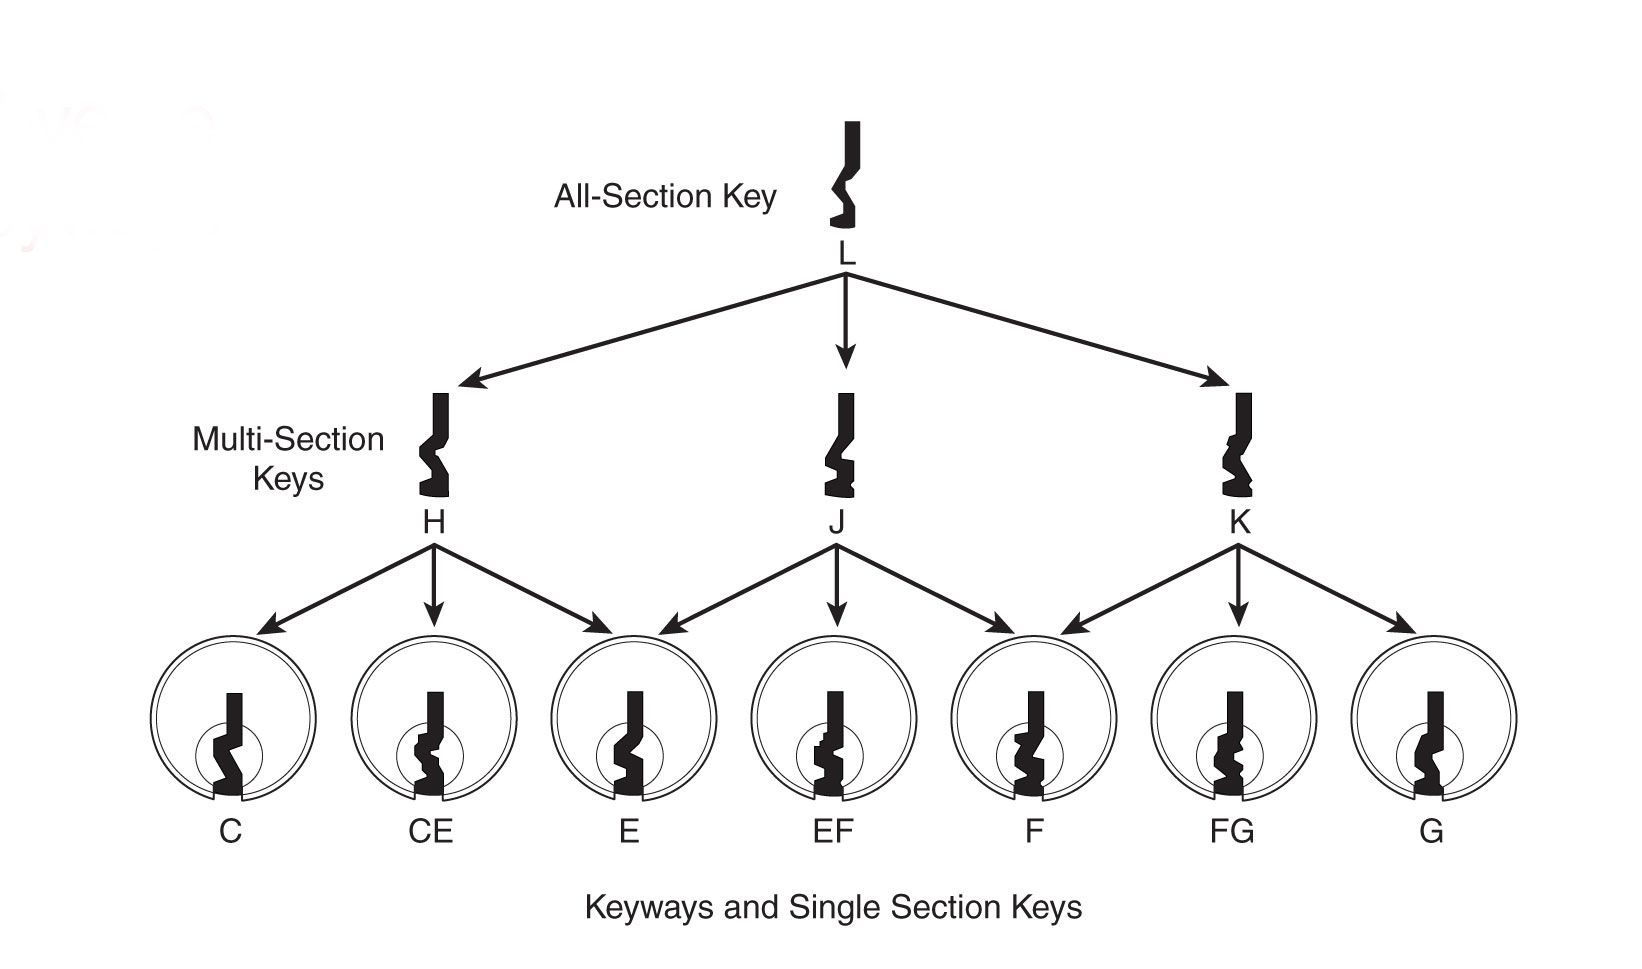 medium resolution of schlage classic keyways and single section keys diagram mr locksmith